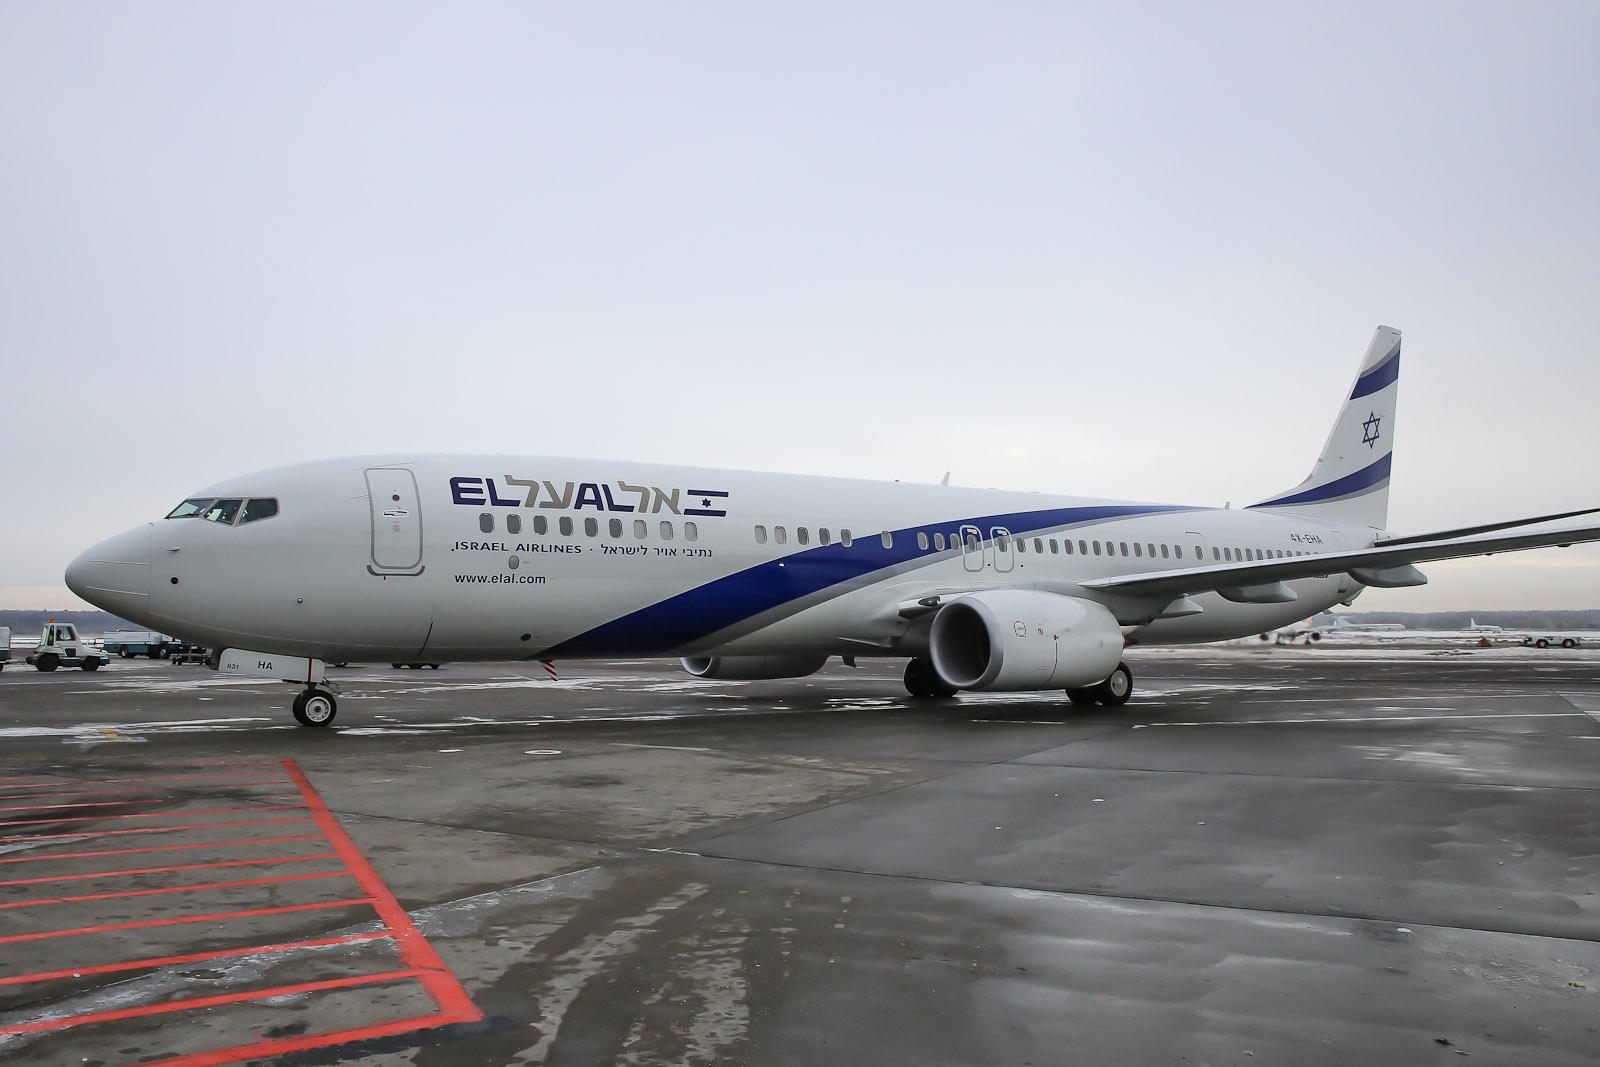 Боинг-737-900 авиакомпании El Al в аэропорту Домодедово